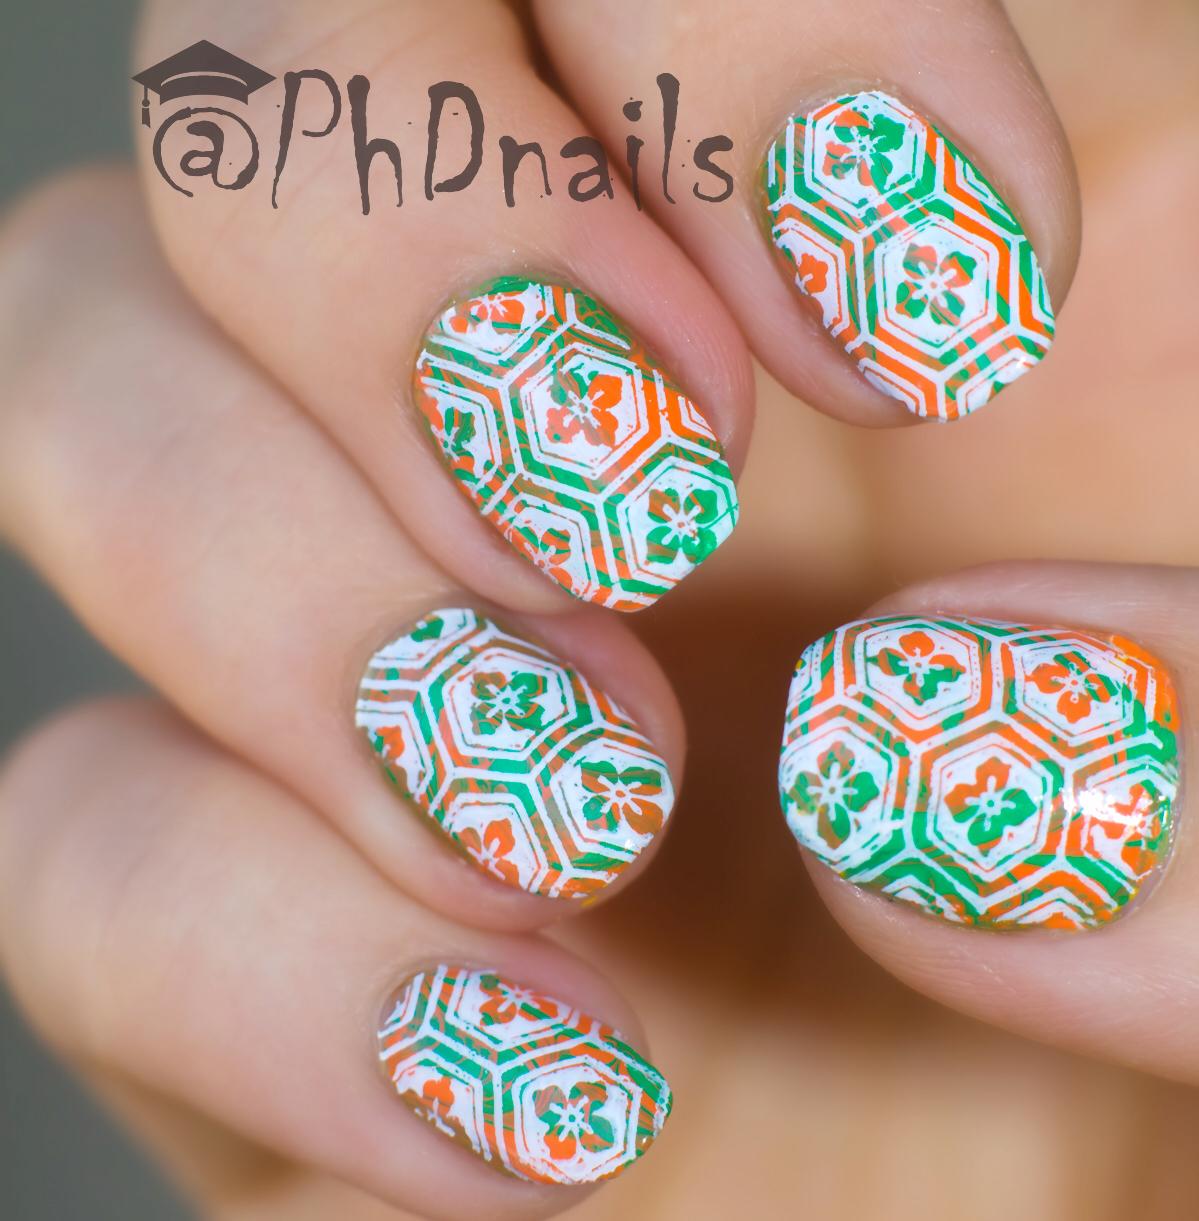 Phd Nails Mosaic Water Marble Nail Design With Pipe Dream Polish